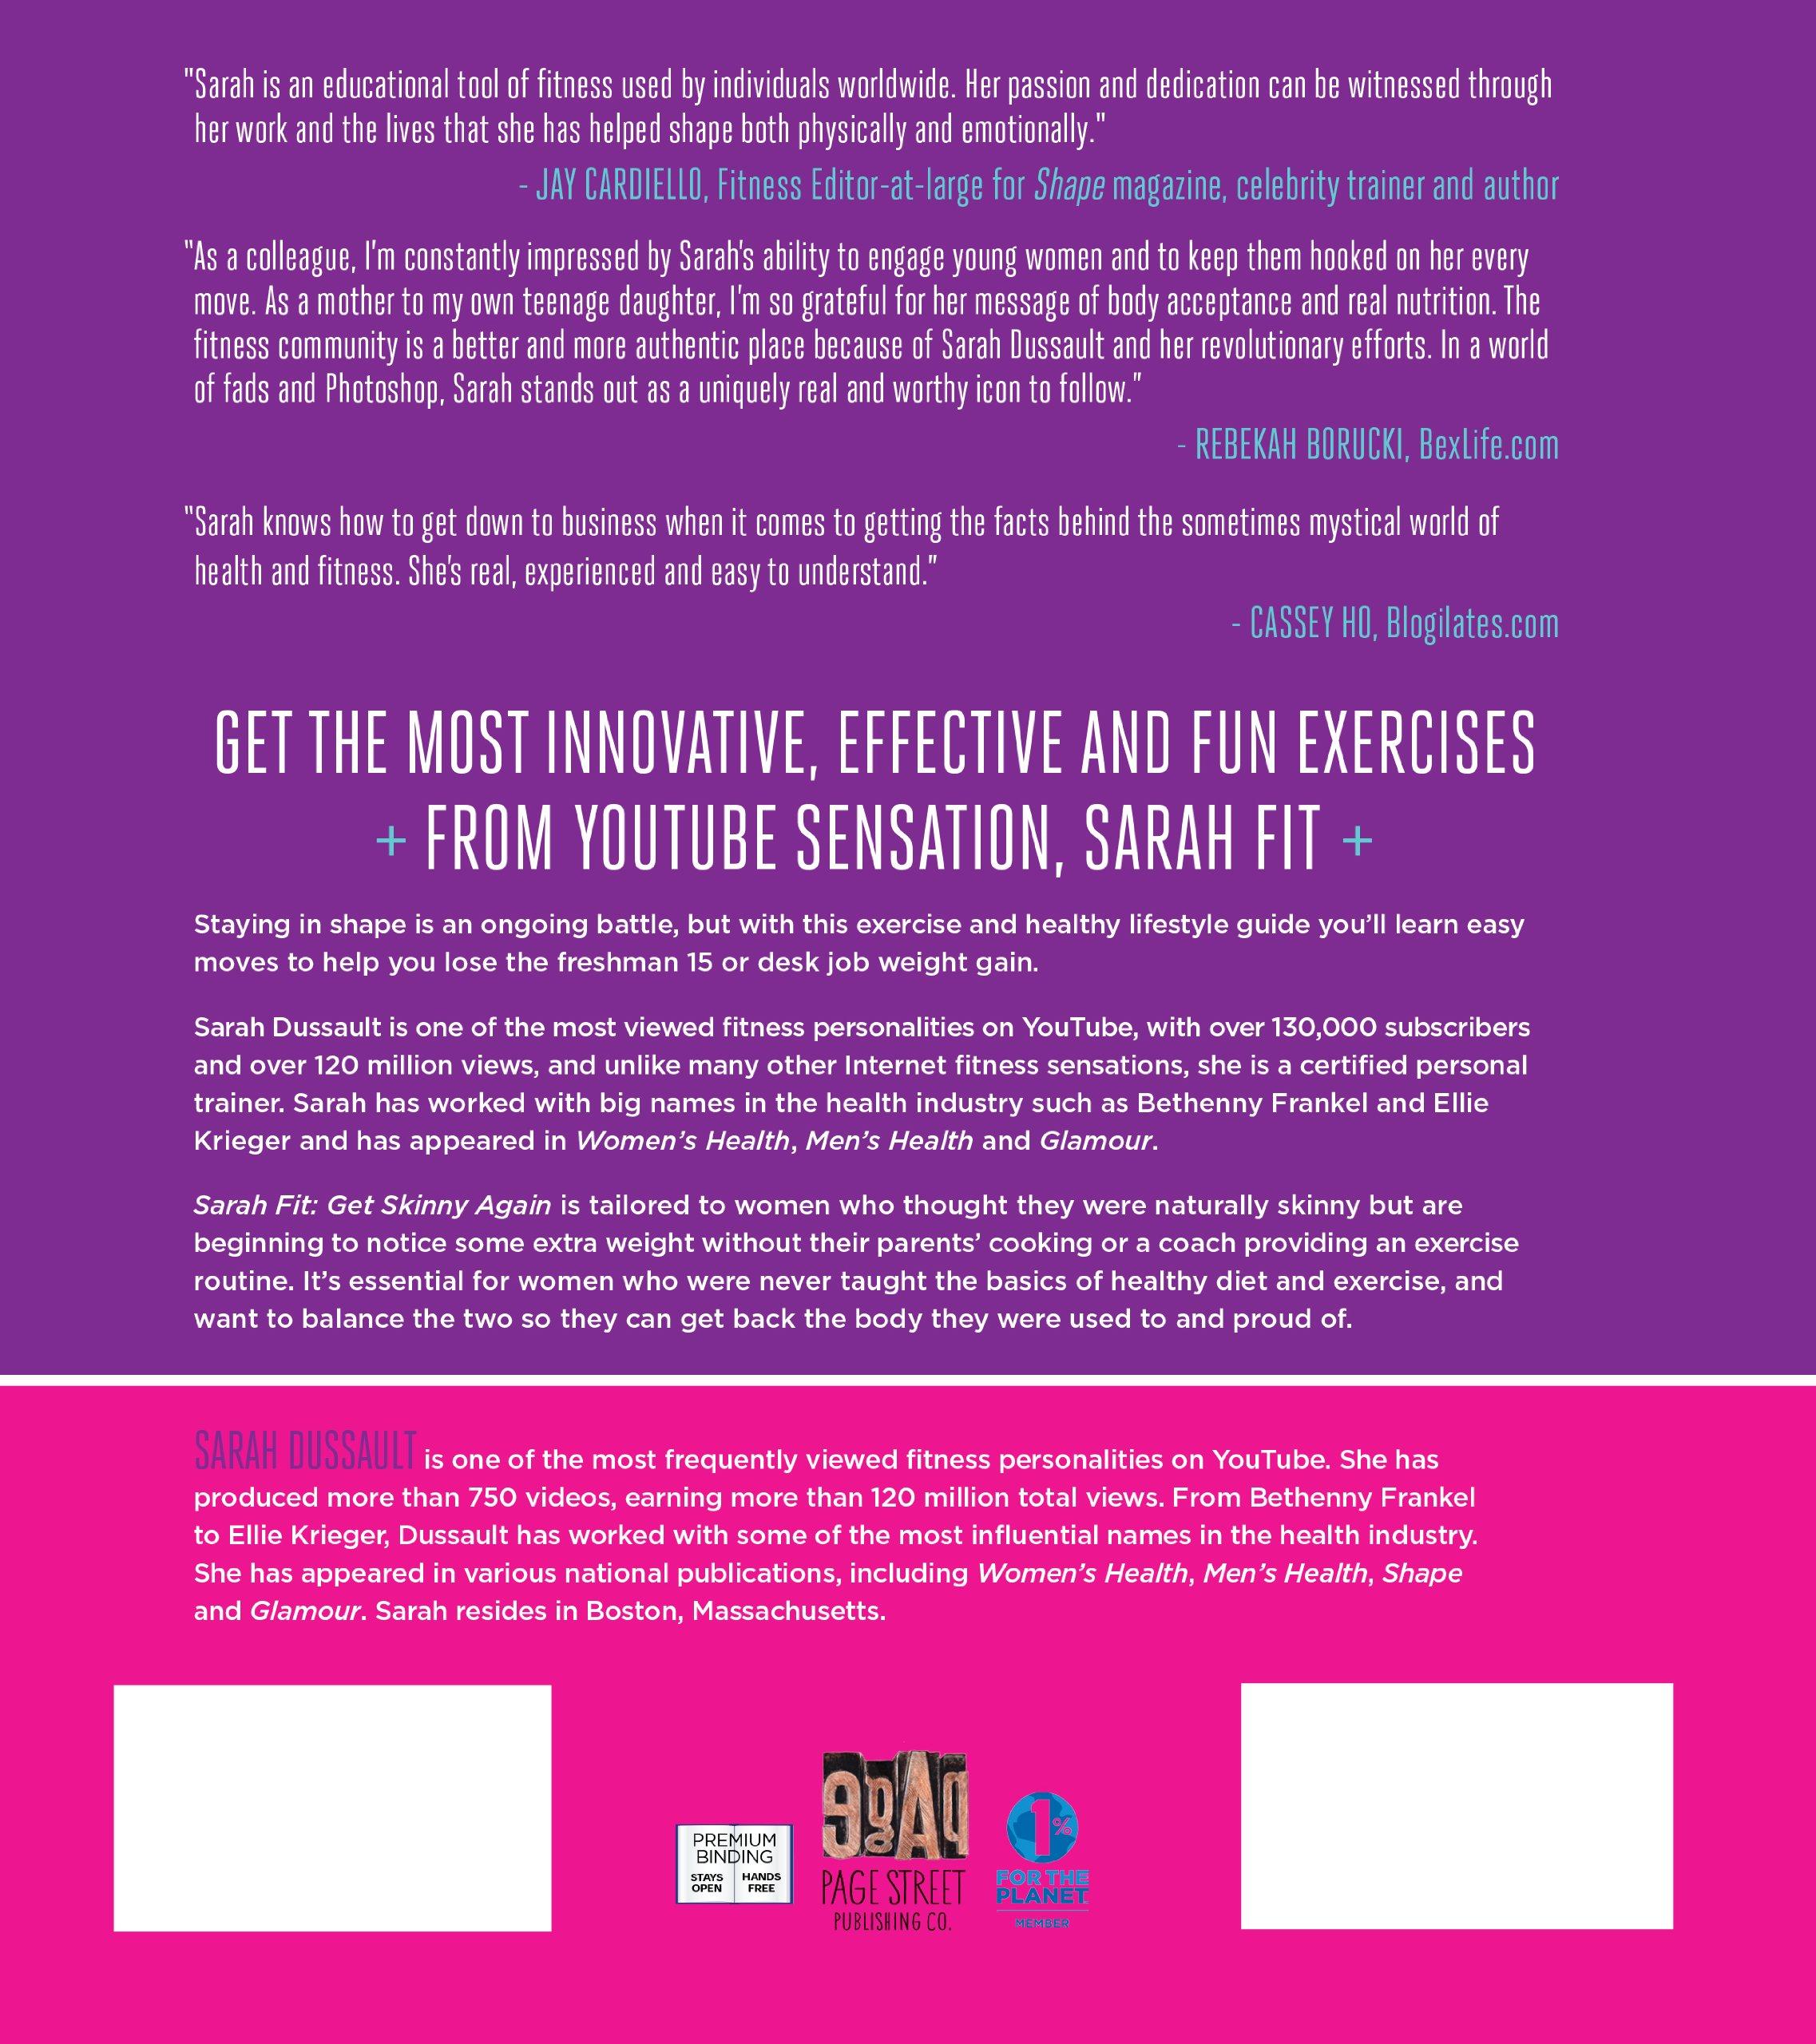 Sarah fit get skinny again the right exercises to get back your sarah fit get skinny again the right exercises to get back your dream body and the secrets to living a fit life sarah dussault 9781624140327 xflitez Images